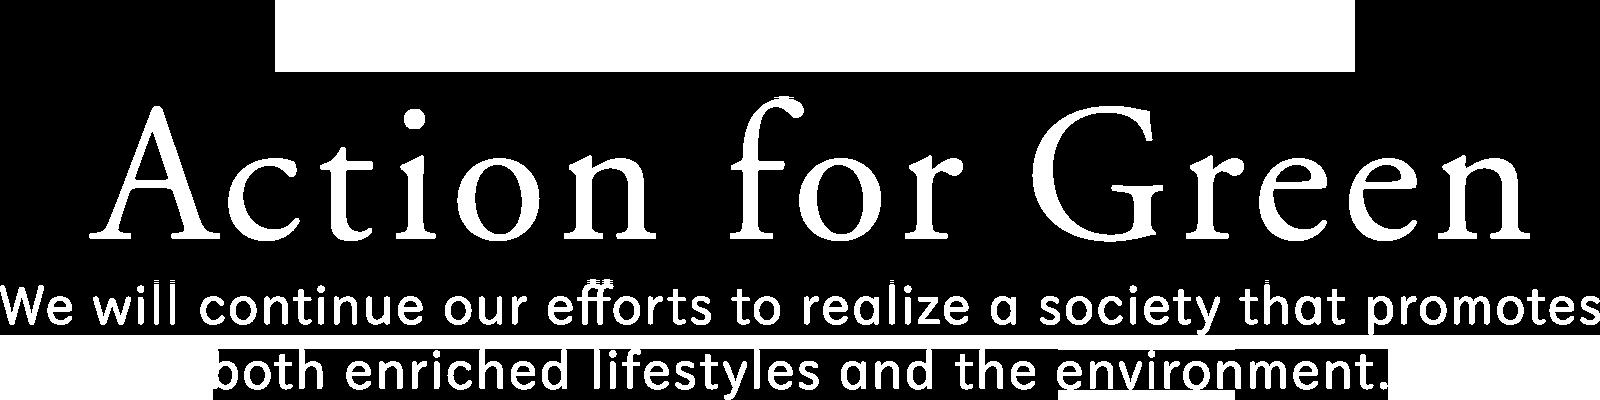 Environmental Activities | Canon global